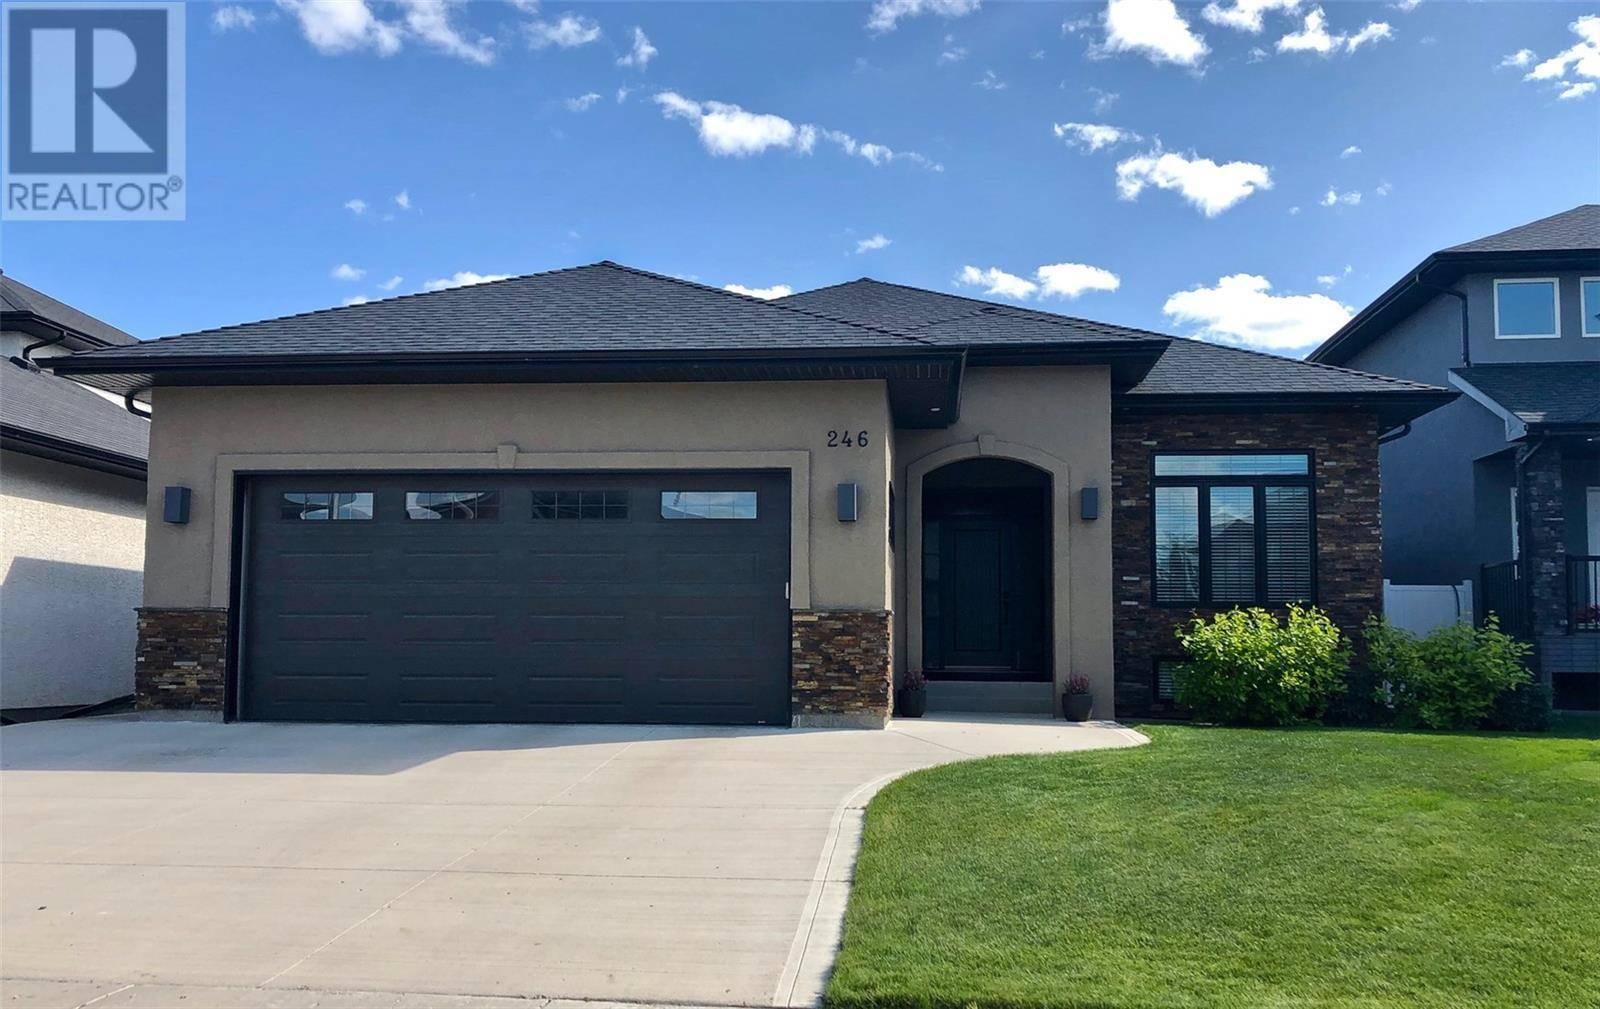 House for sale at 246 Pohorecky St Saskatoon Saskatchewan - MLS: SK783096